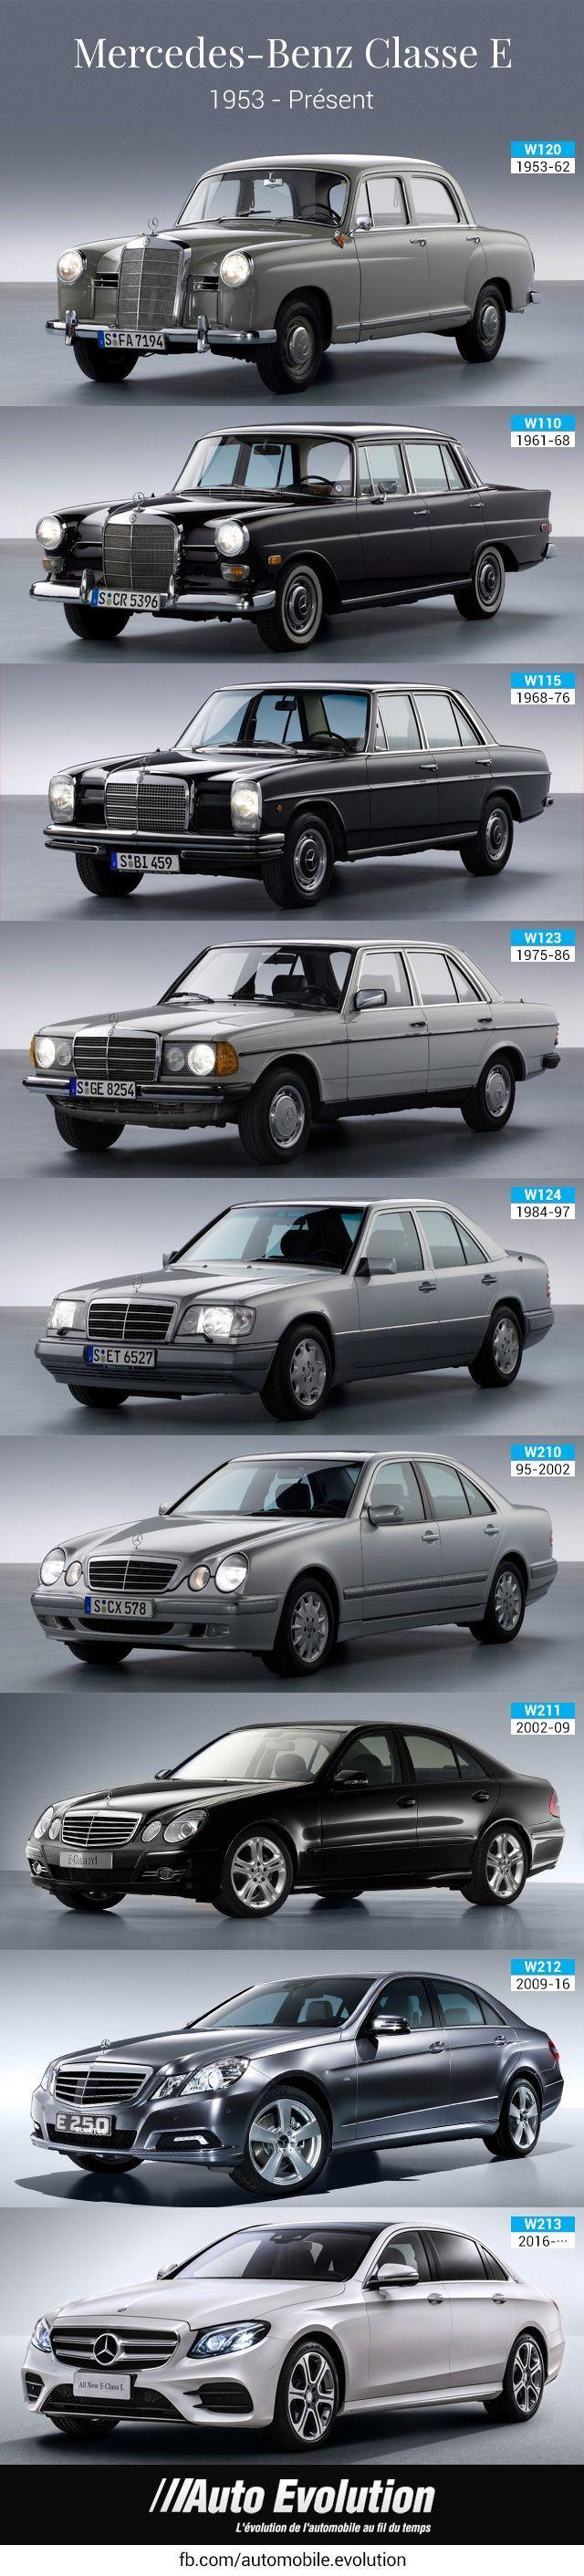 Mercedes Benz E class evolution Histoire Mercedes Benz Classe E #mercedesvintage…